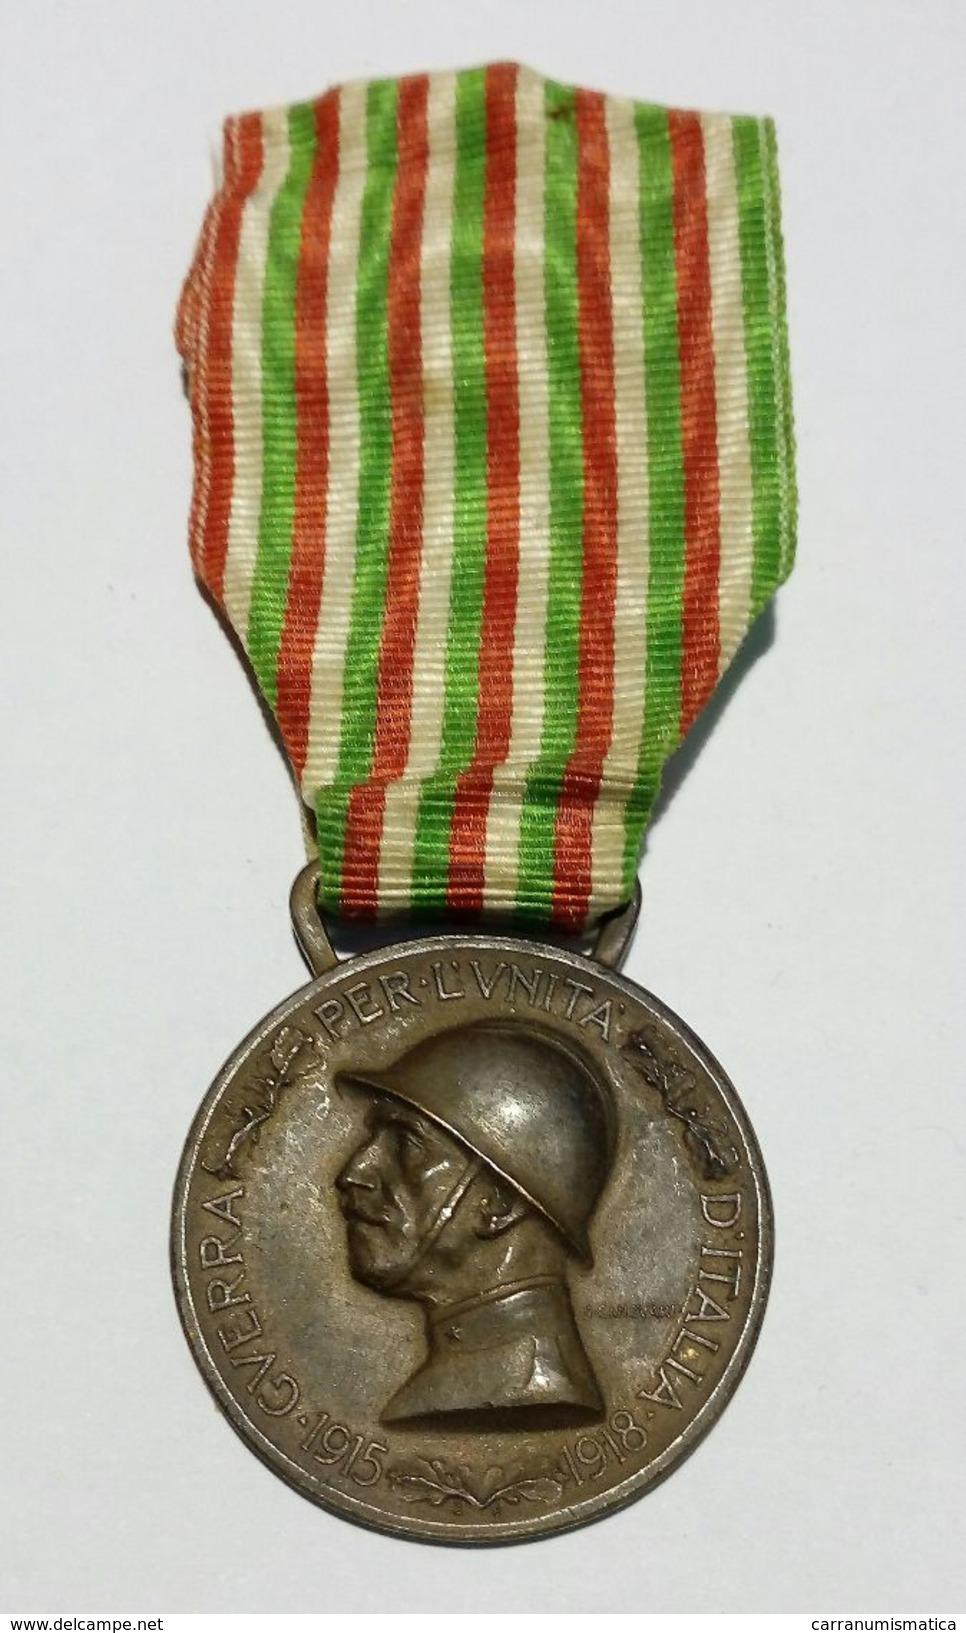 WWI - MEDAGLIA - GUERRA ITALO - AUSTRIACA (1915-1918) Bronzo Nemico / Nastro Originale - Italia